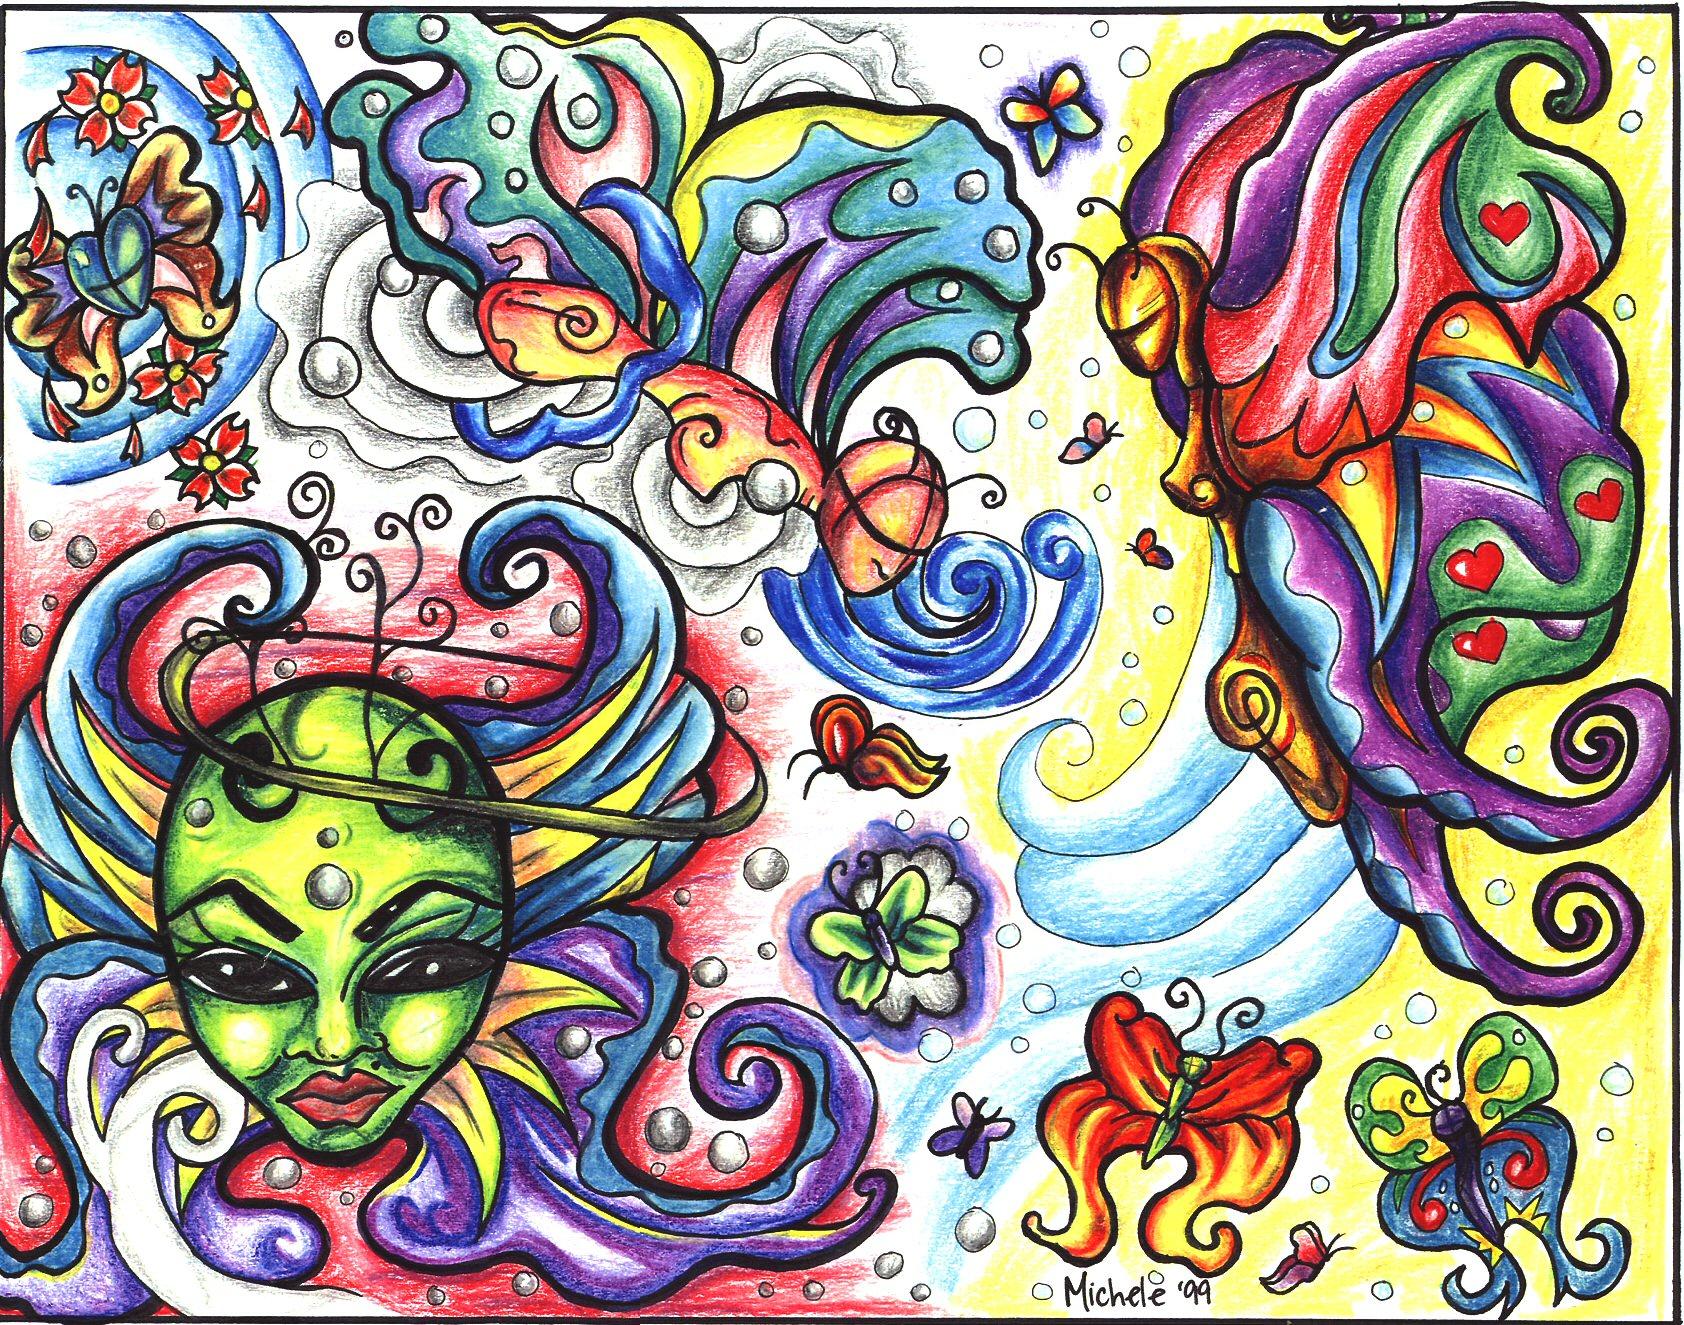 Psychadelie